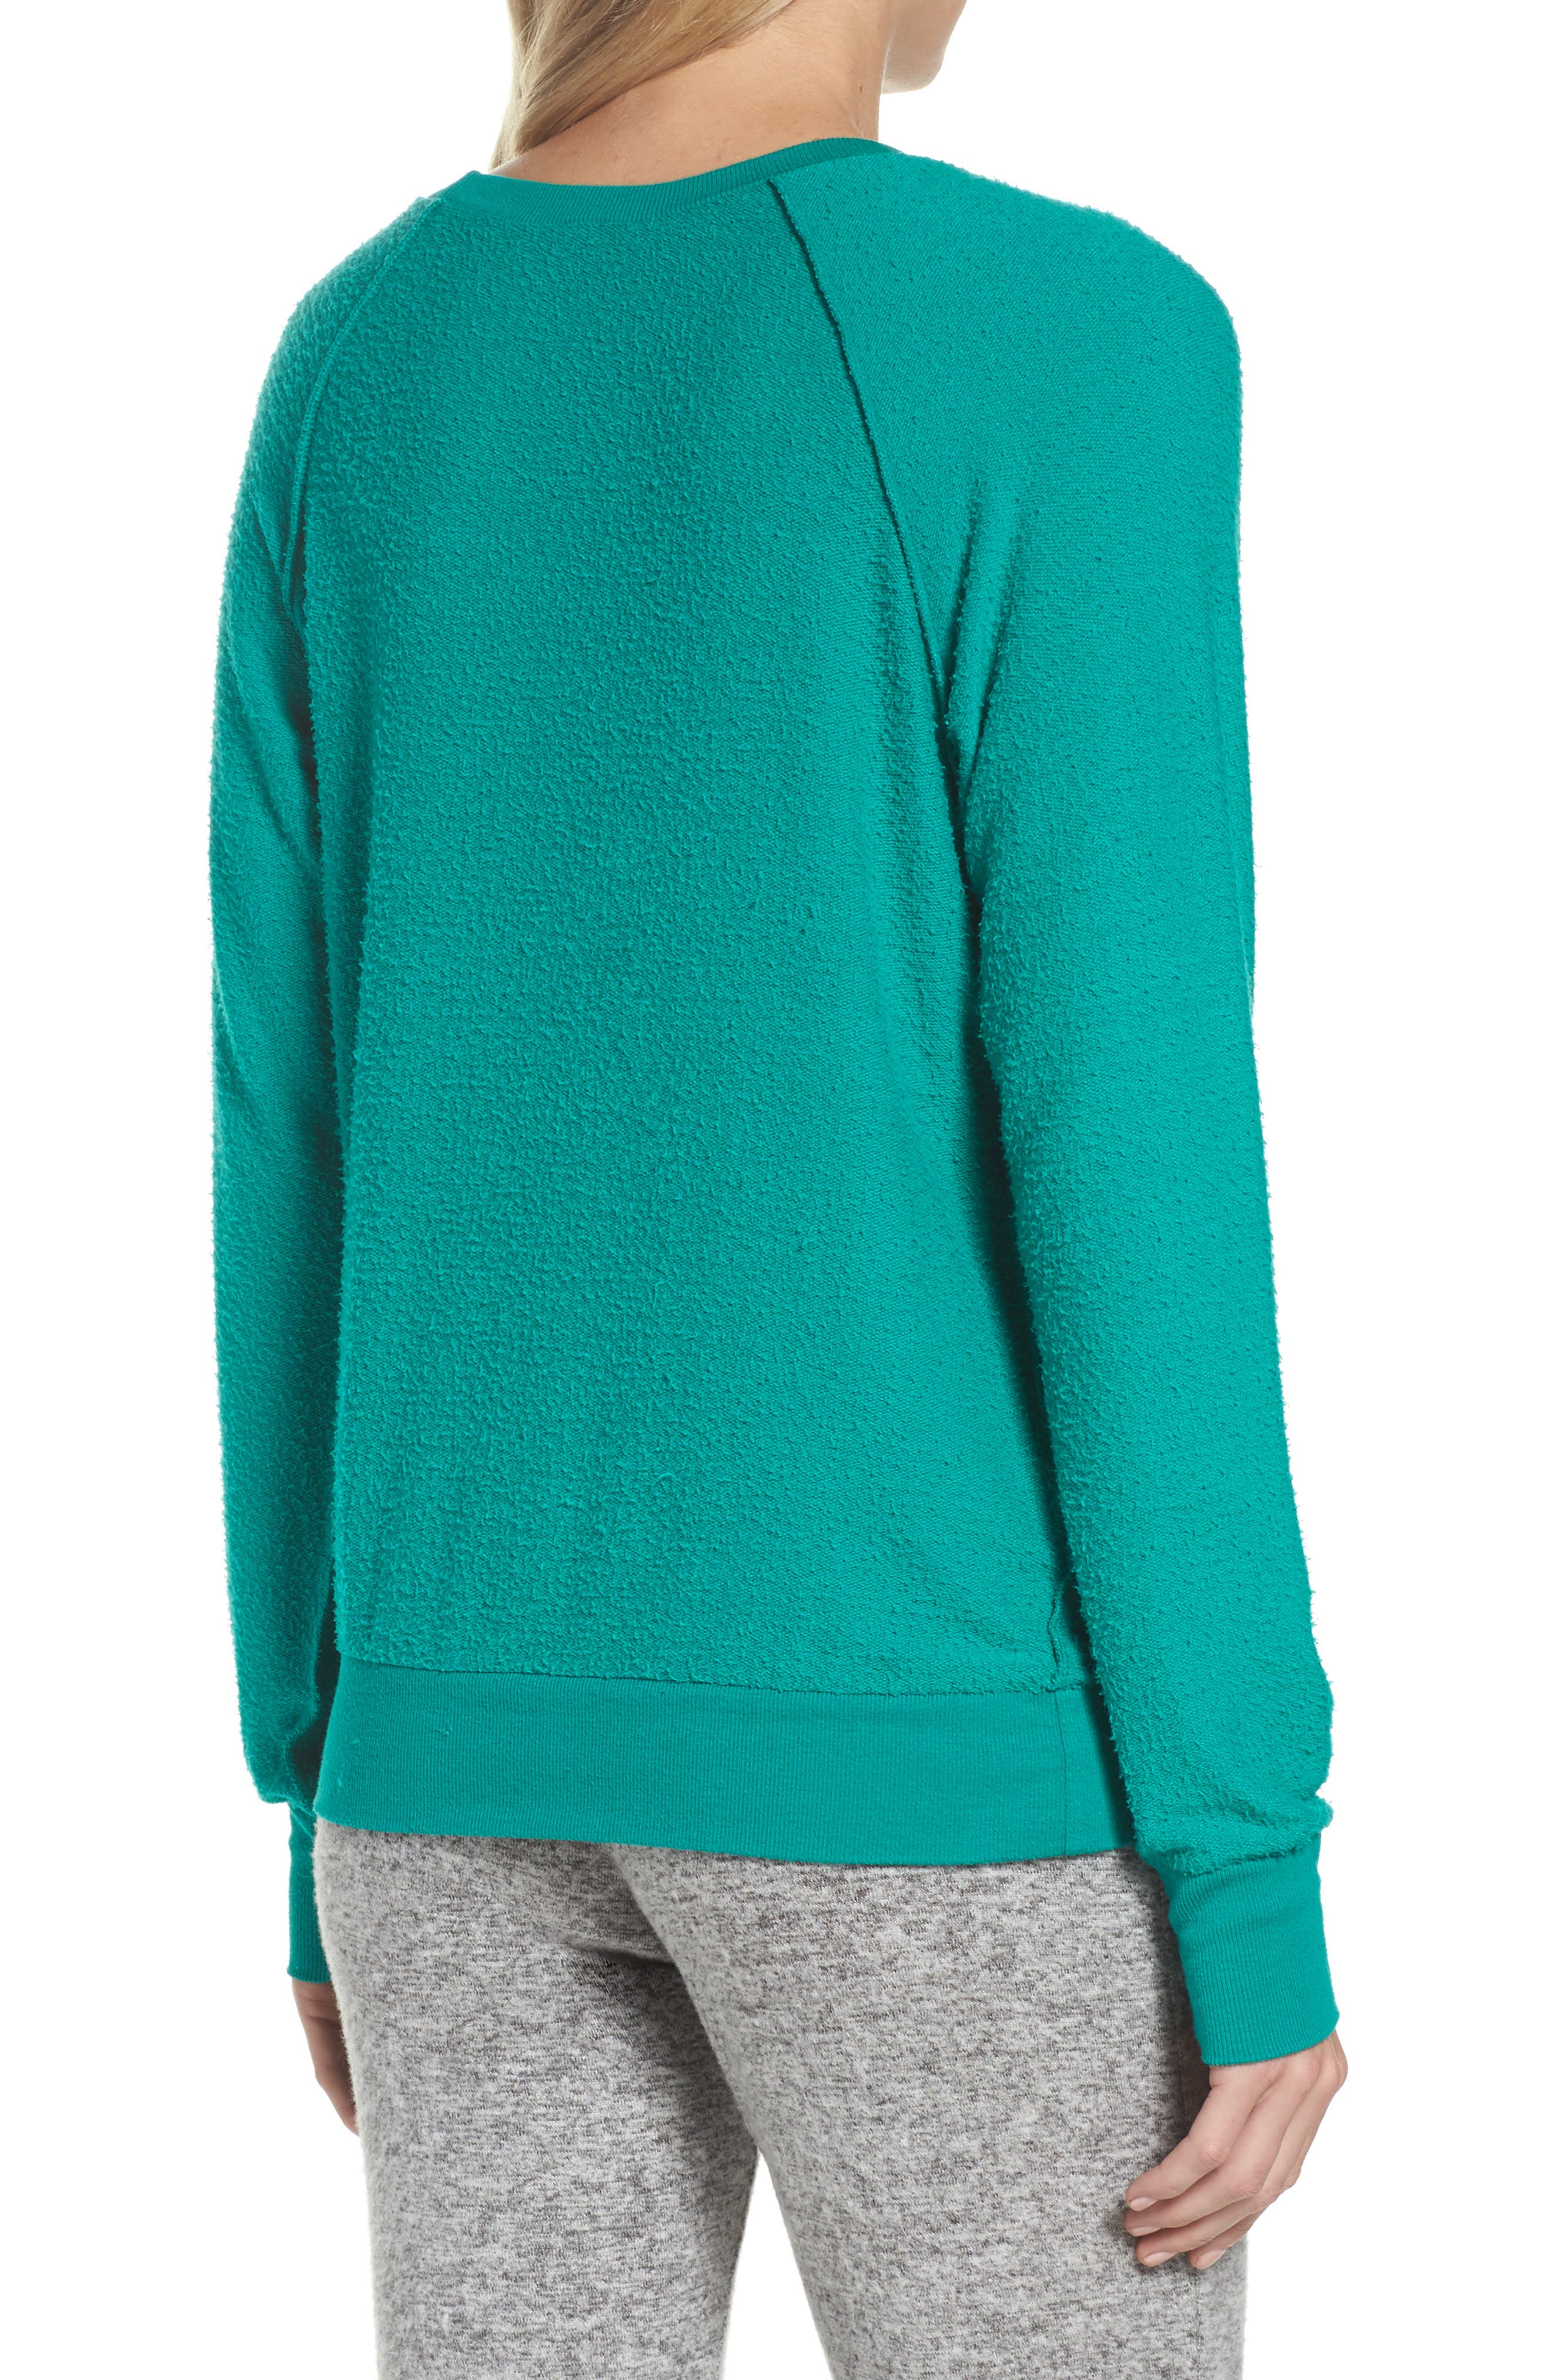 Edge Sweatshirt,                             Alternate thumbnail 4, color,